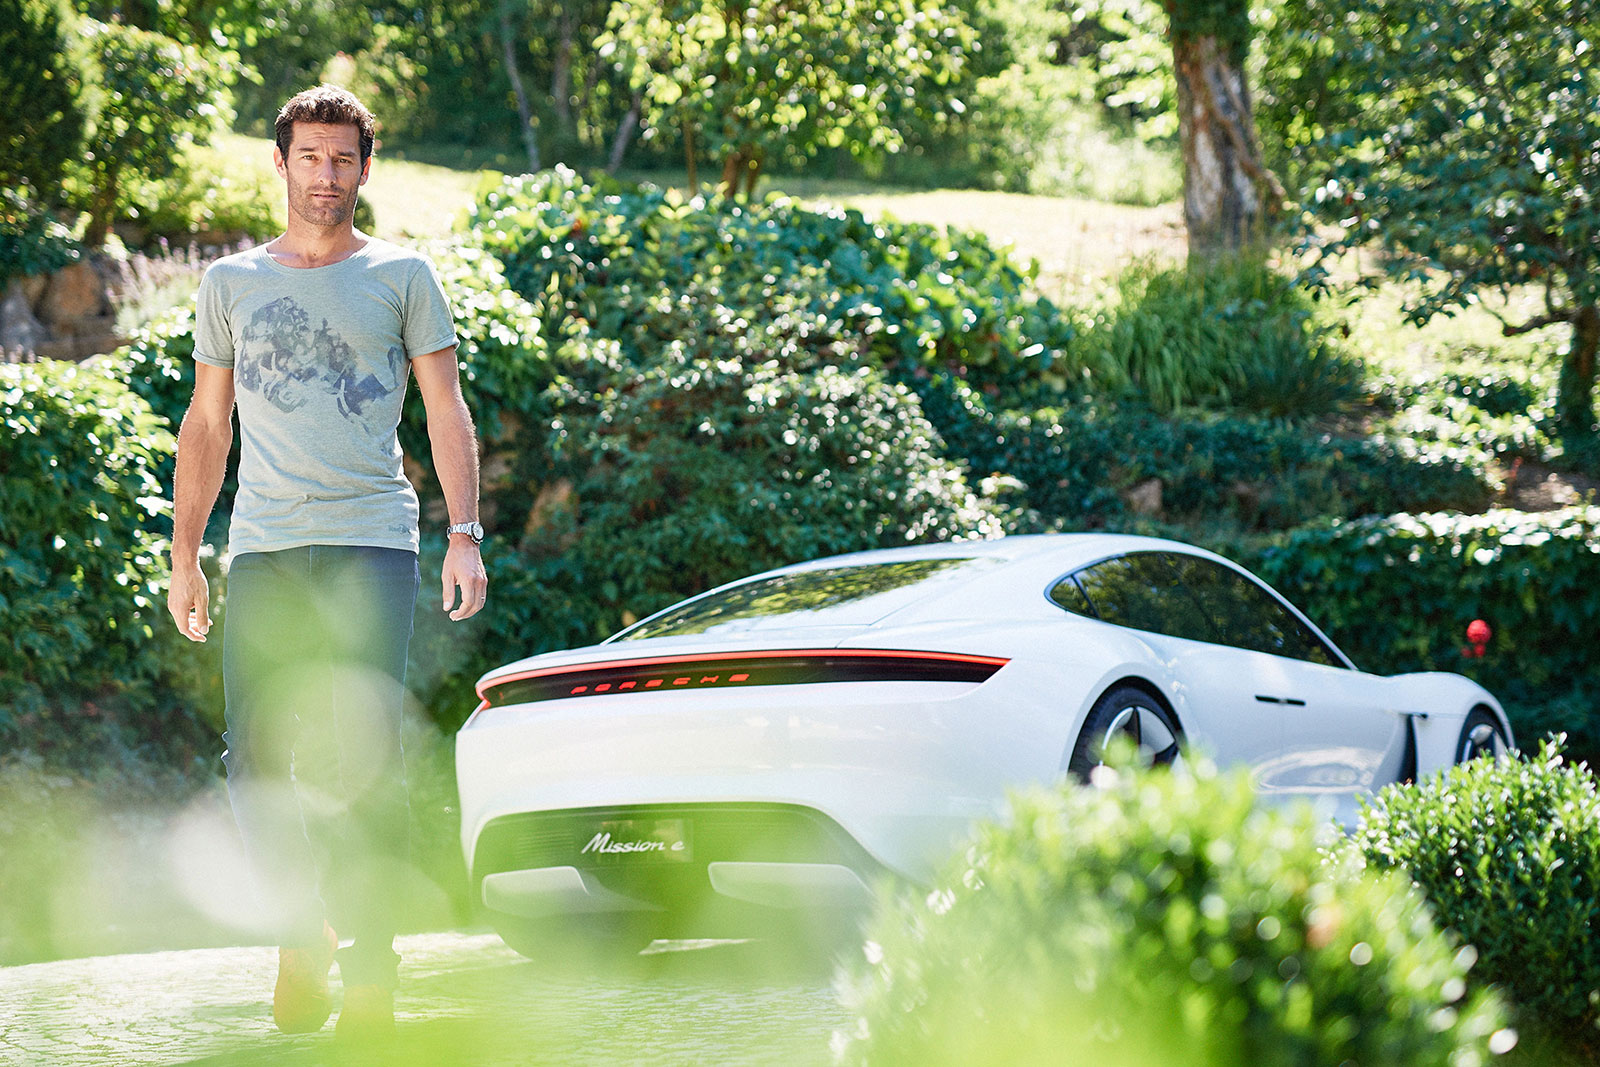 Formula 1 driver Mark Webber and the Porsche Mission E ...